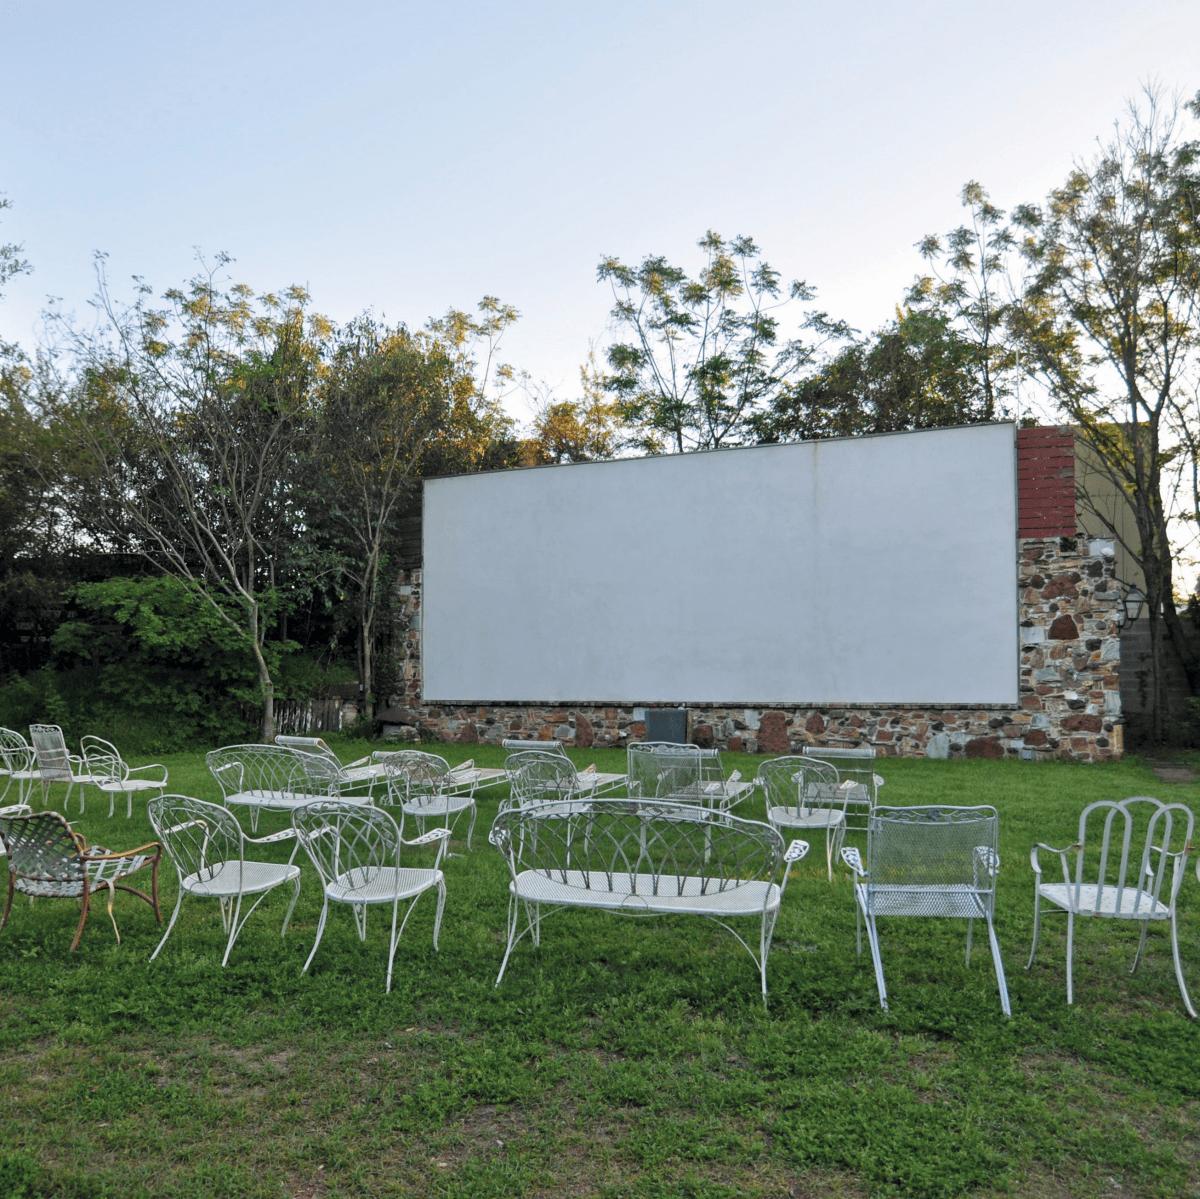 Sekrit Theater